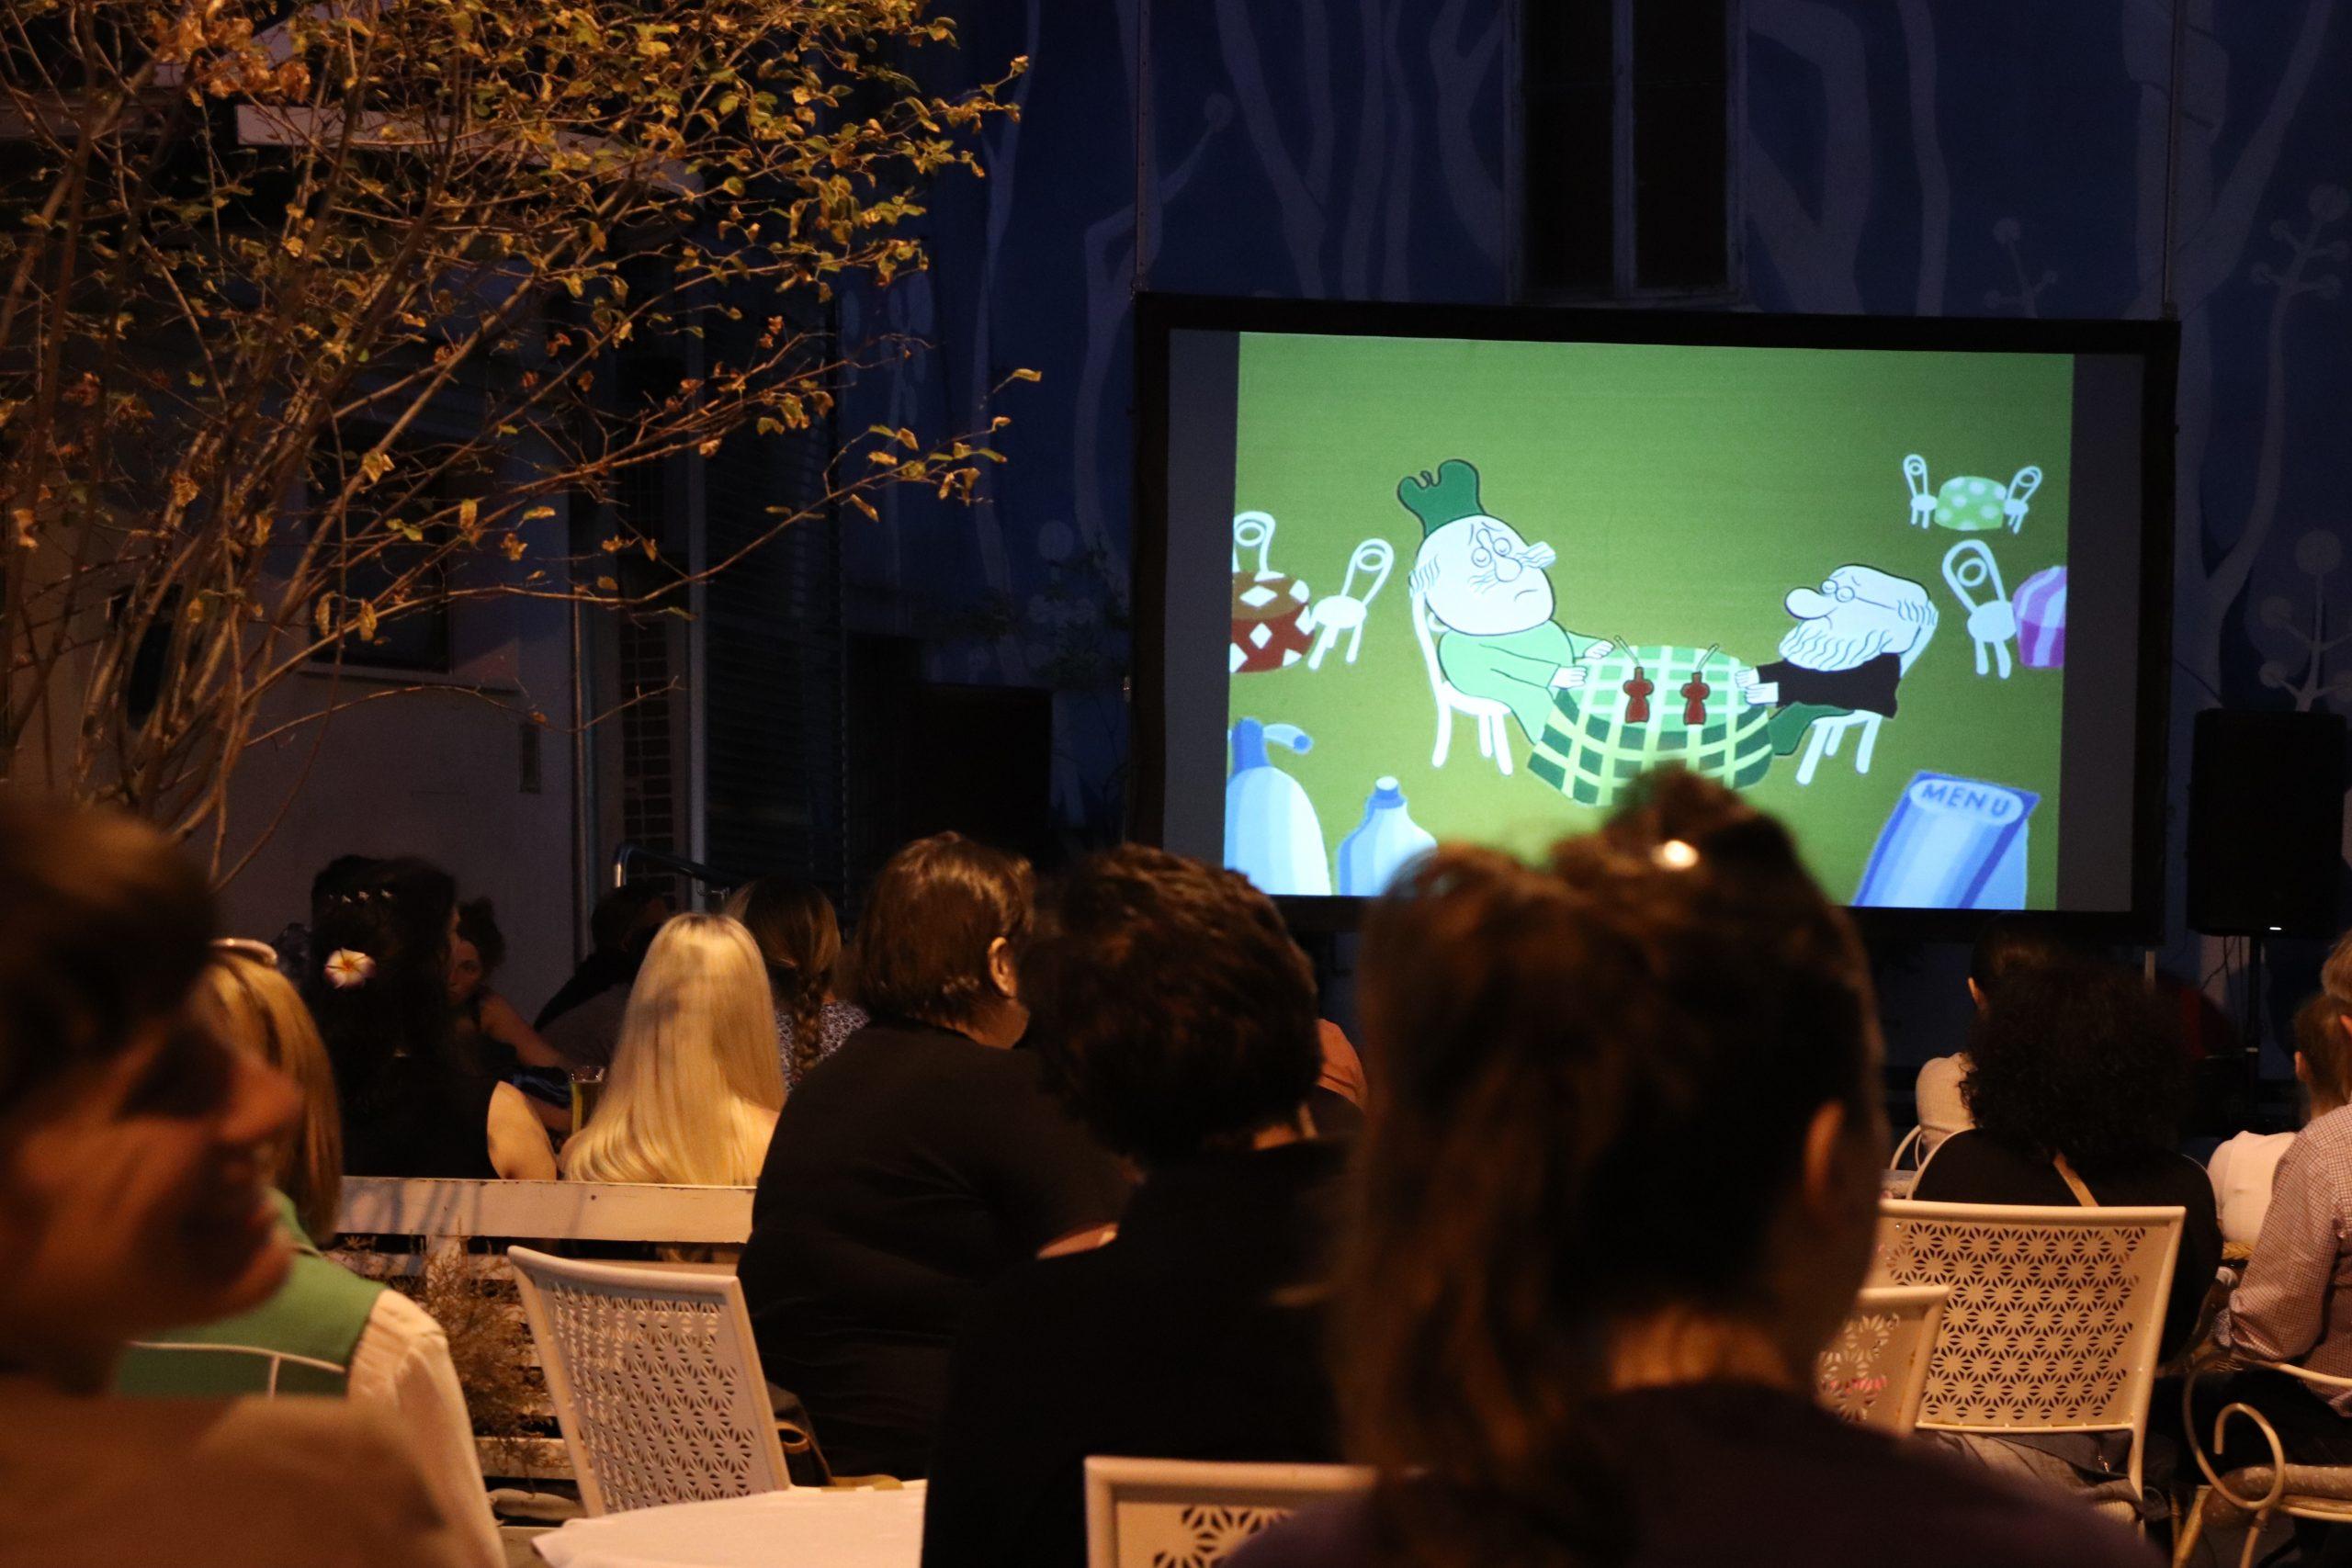 Crtani filmovi Baltazar gledali su se na Čajnom trgu